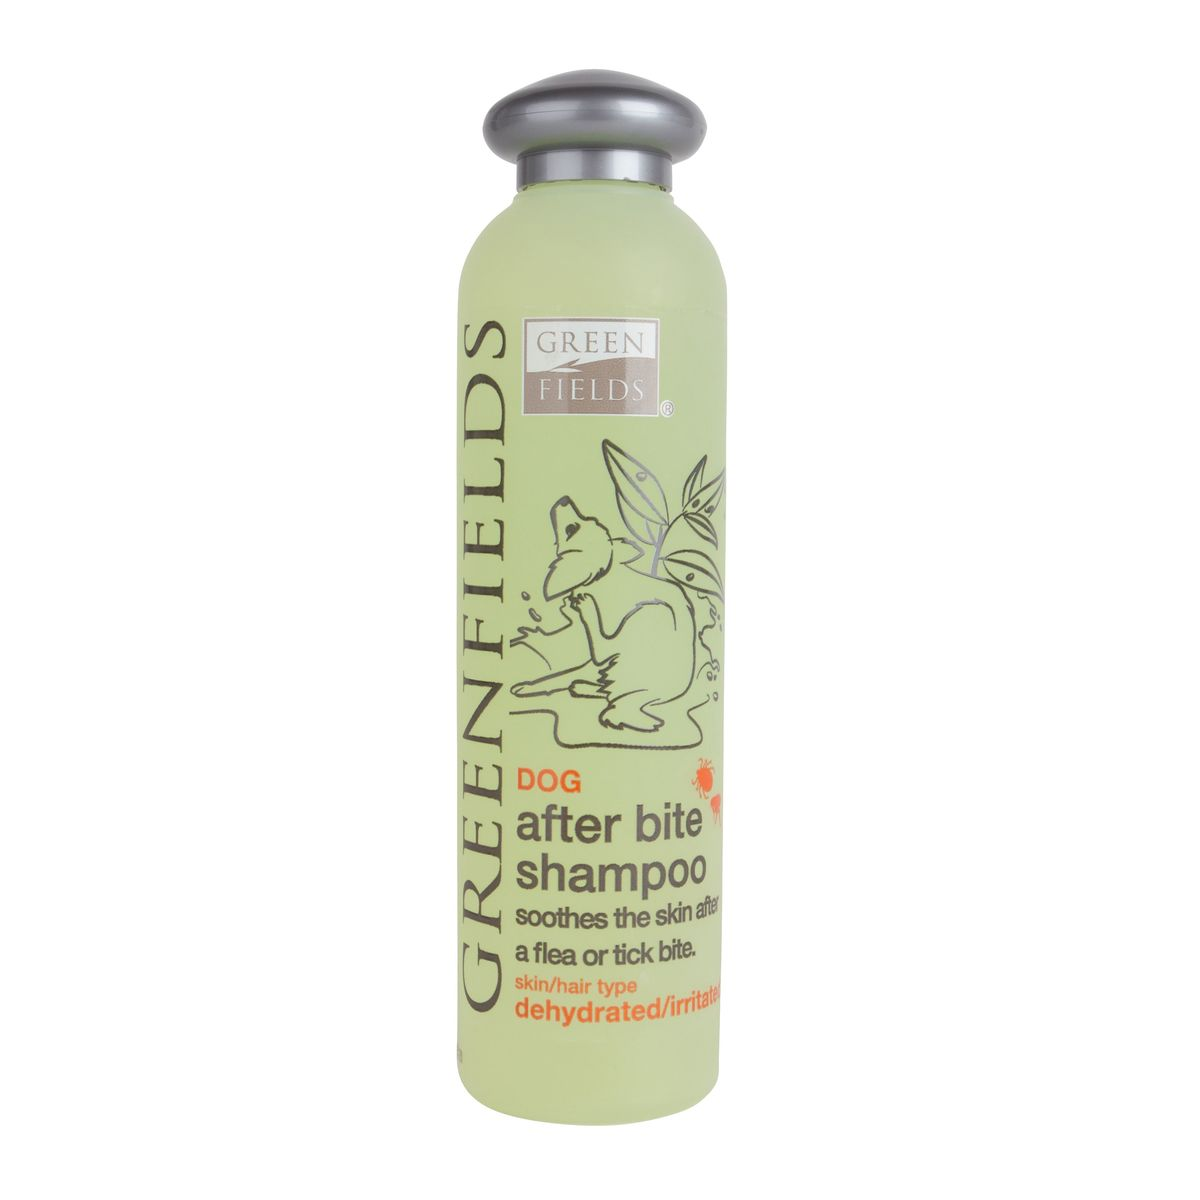 Greenfields Dog After Bite Shampoo